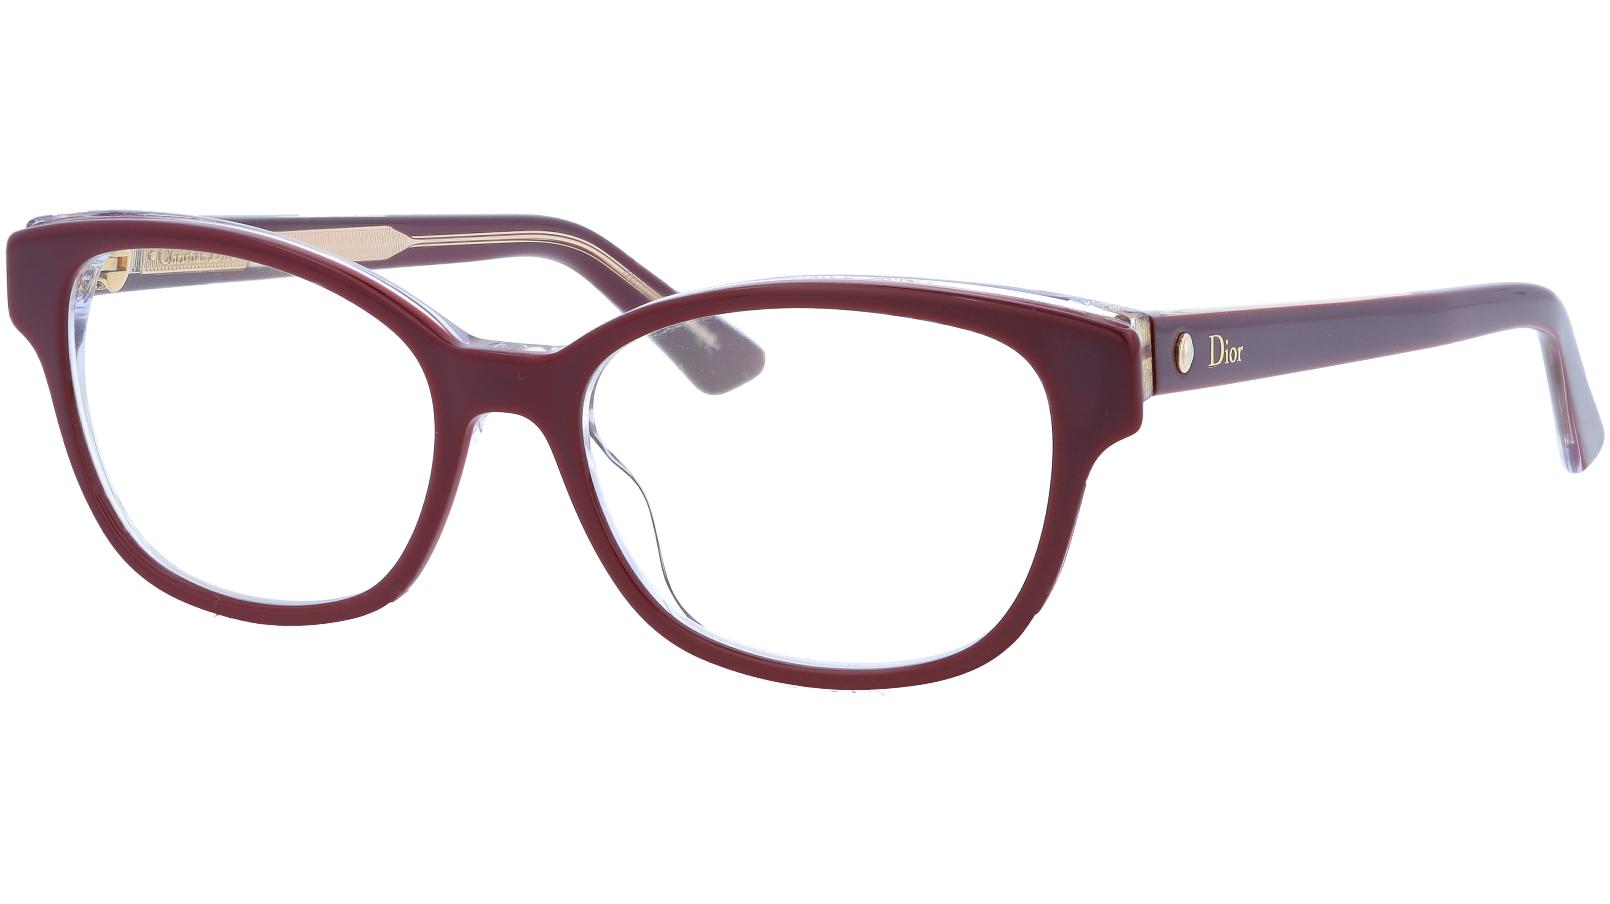 Dior MONTAIGNE3 MVG 52 BurgunDY Glasses